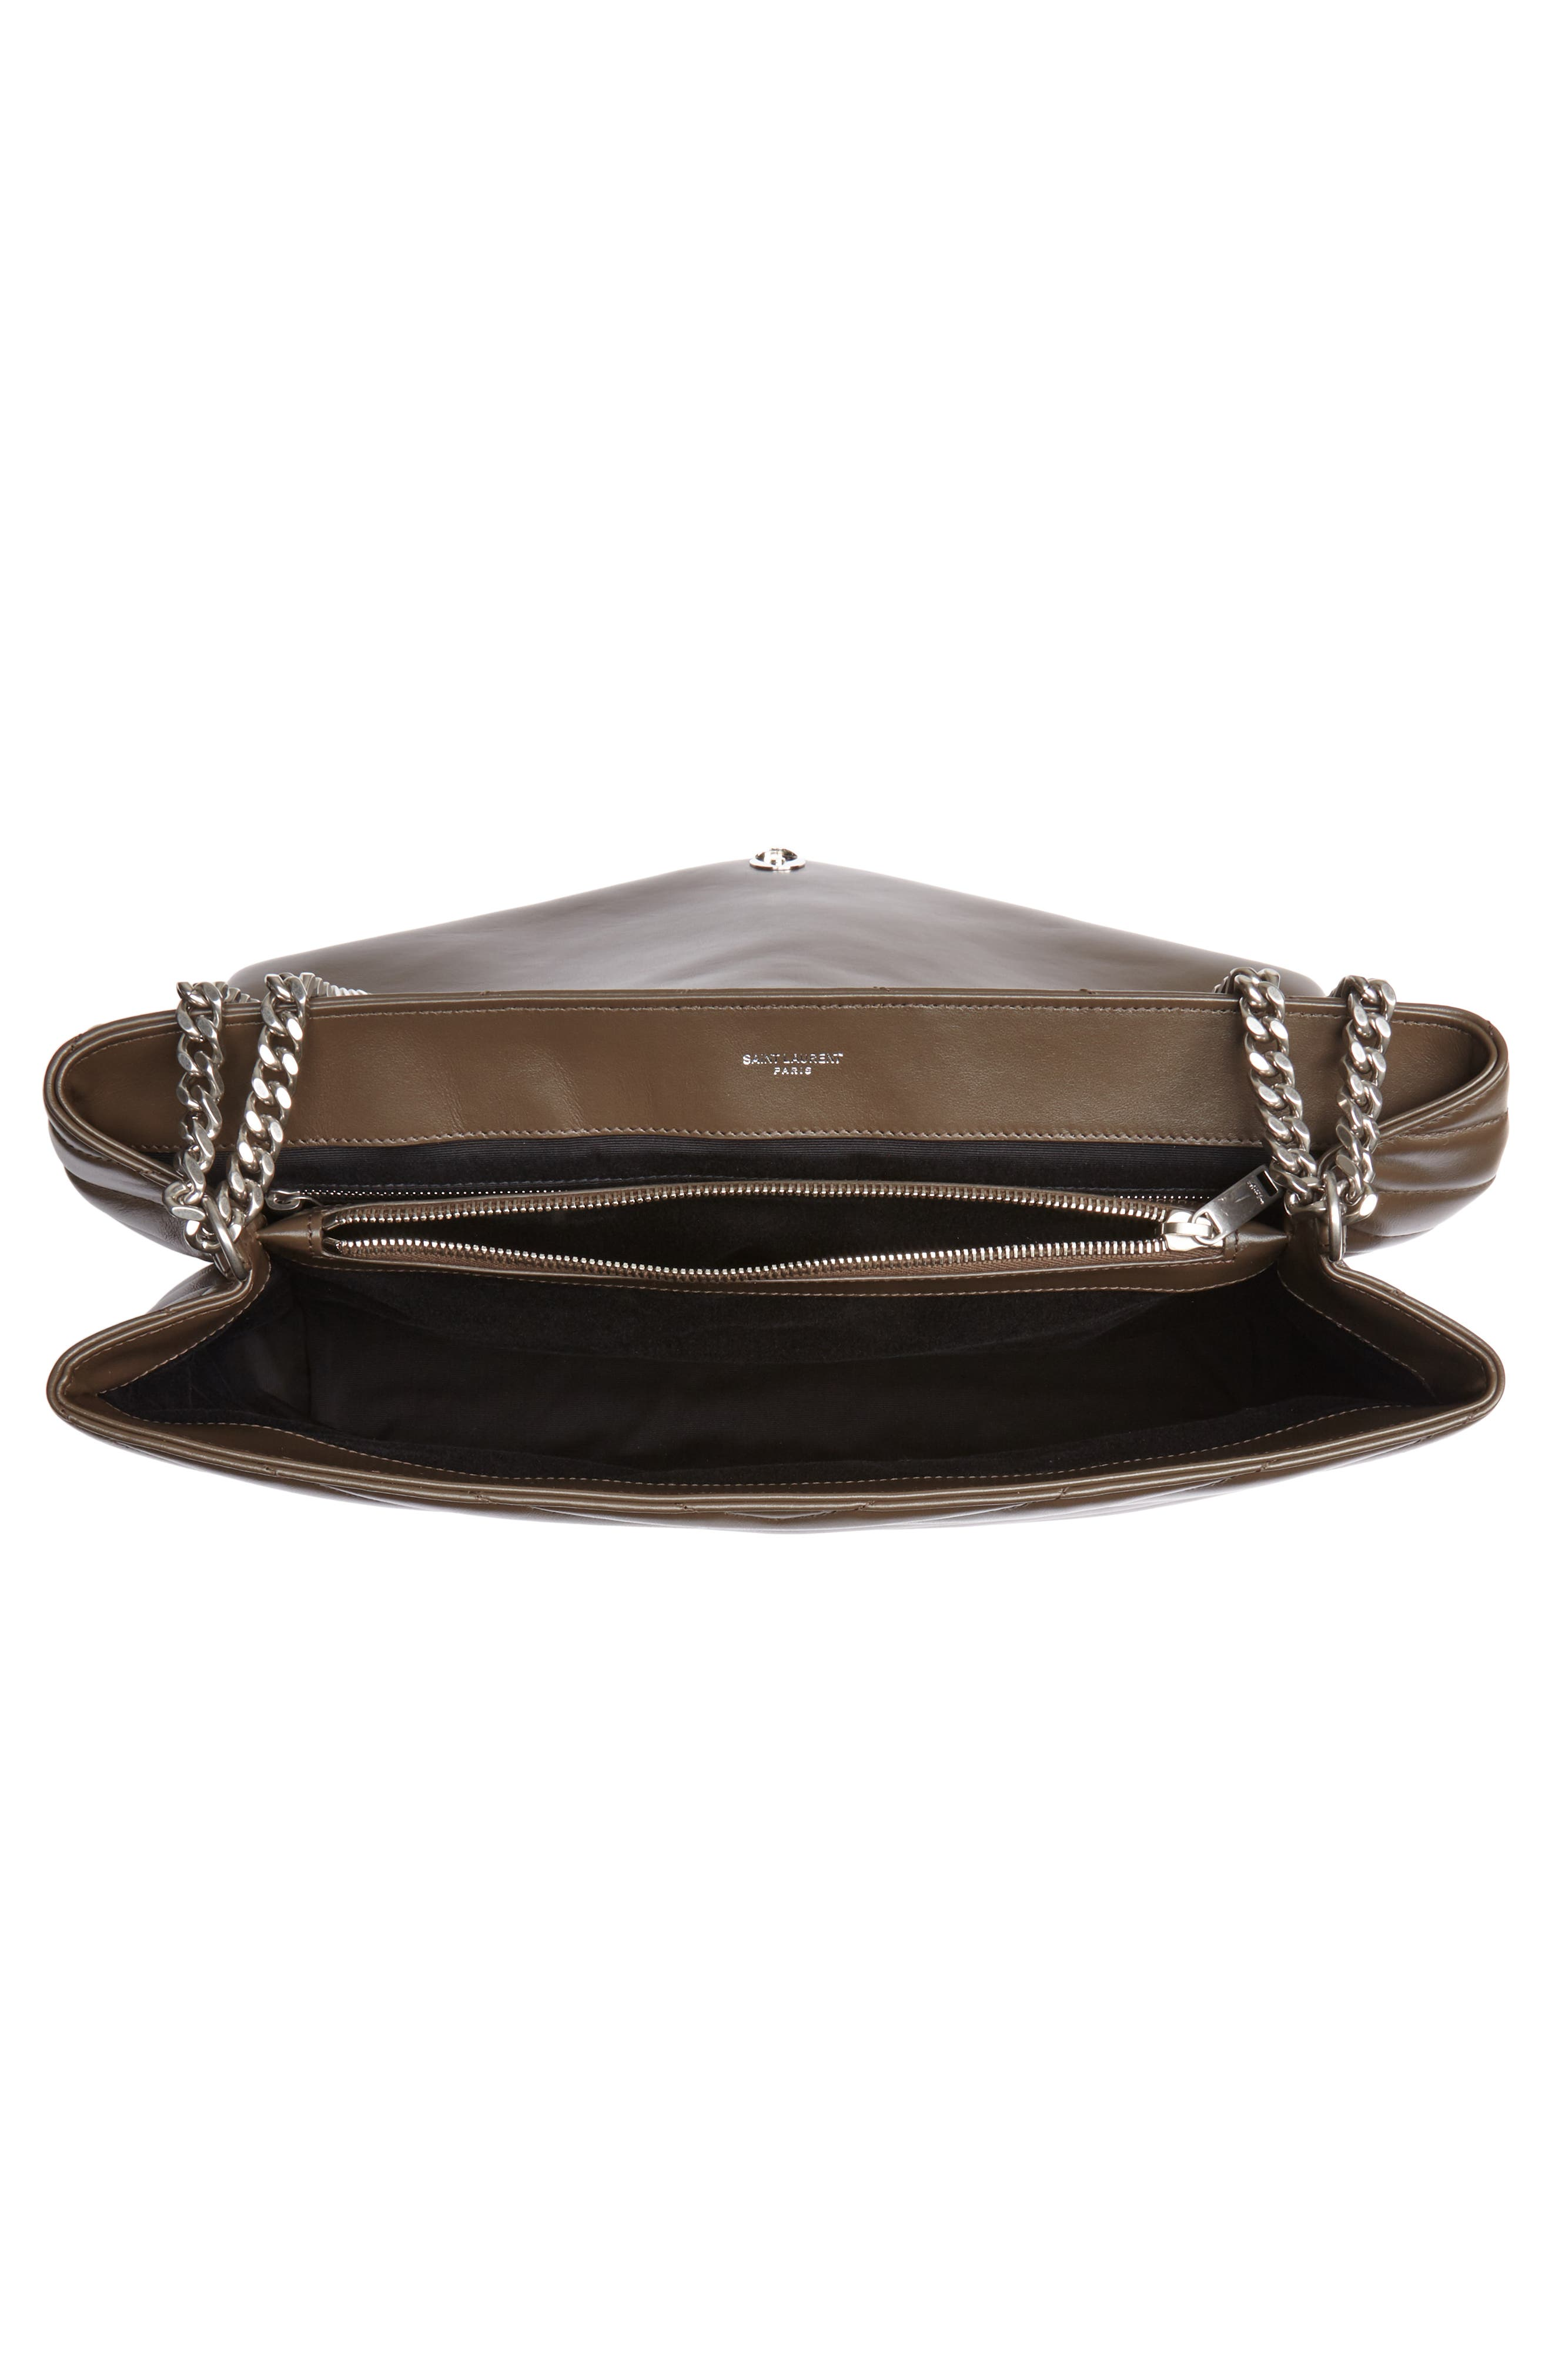 Large Loulou Matelassé Leather Shoulder Bag,                             Alternate thumbnail 4, color,                             FAGGIO/ FAGGIO